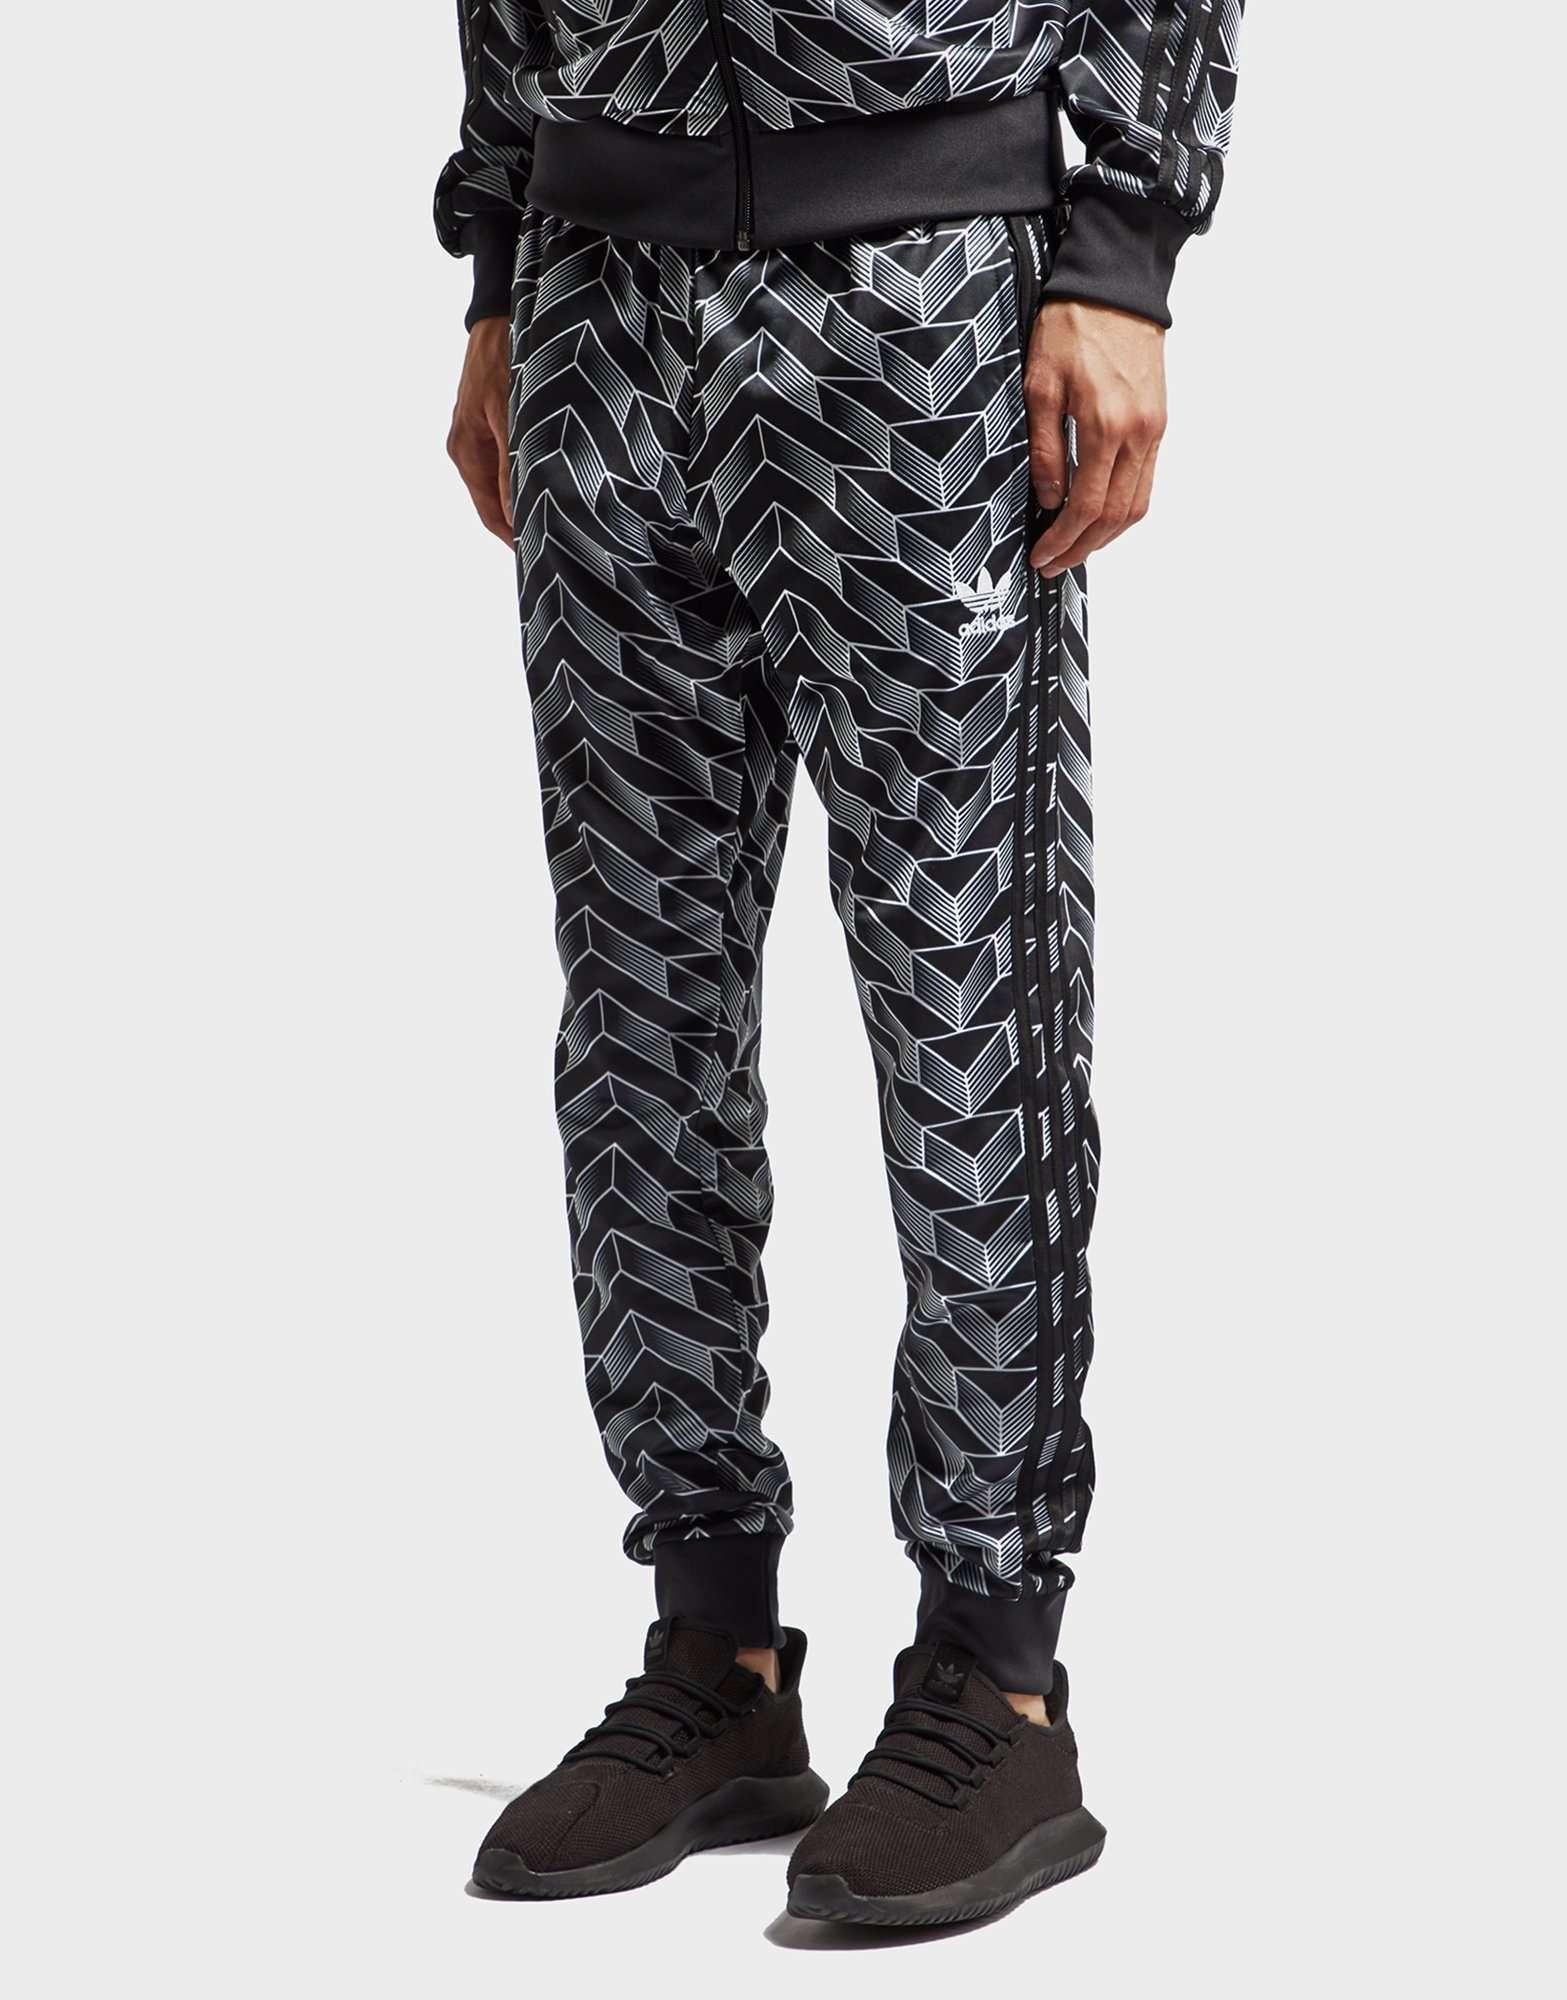 68ef2c1153b8 adidas Originals Soccer Stripe Track Pants